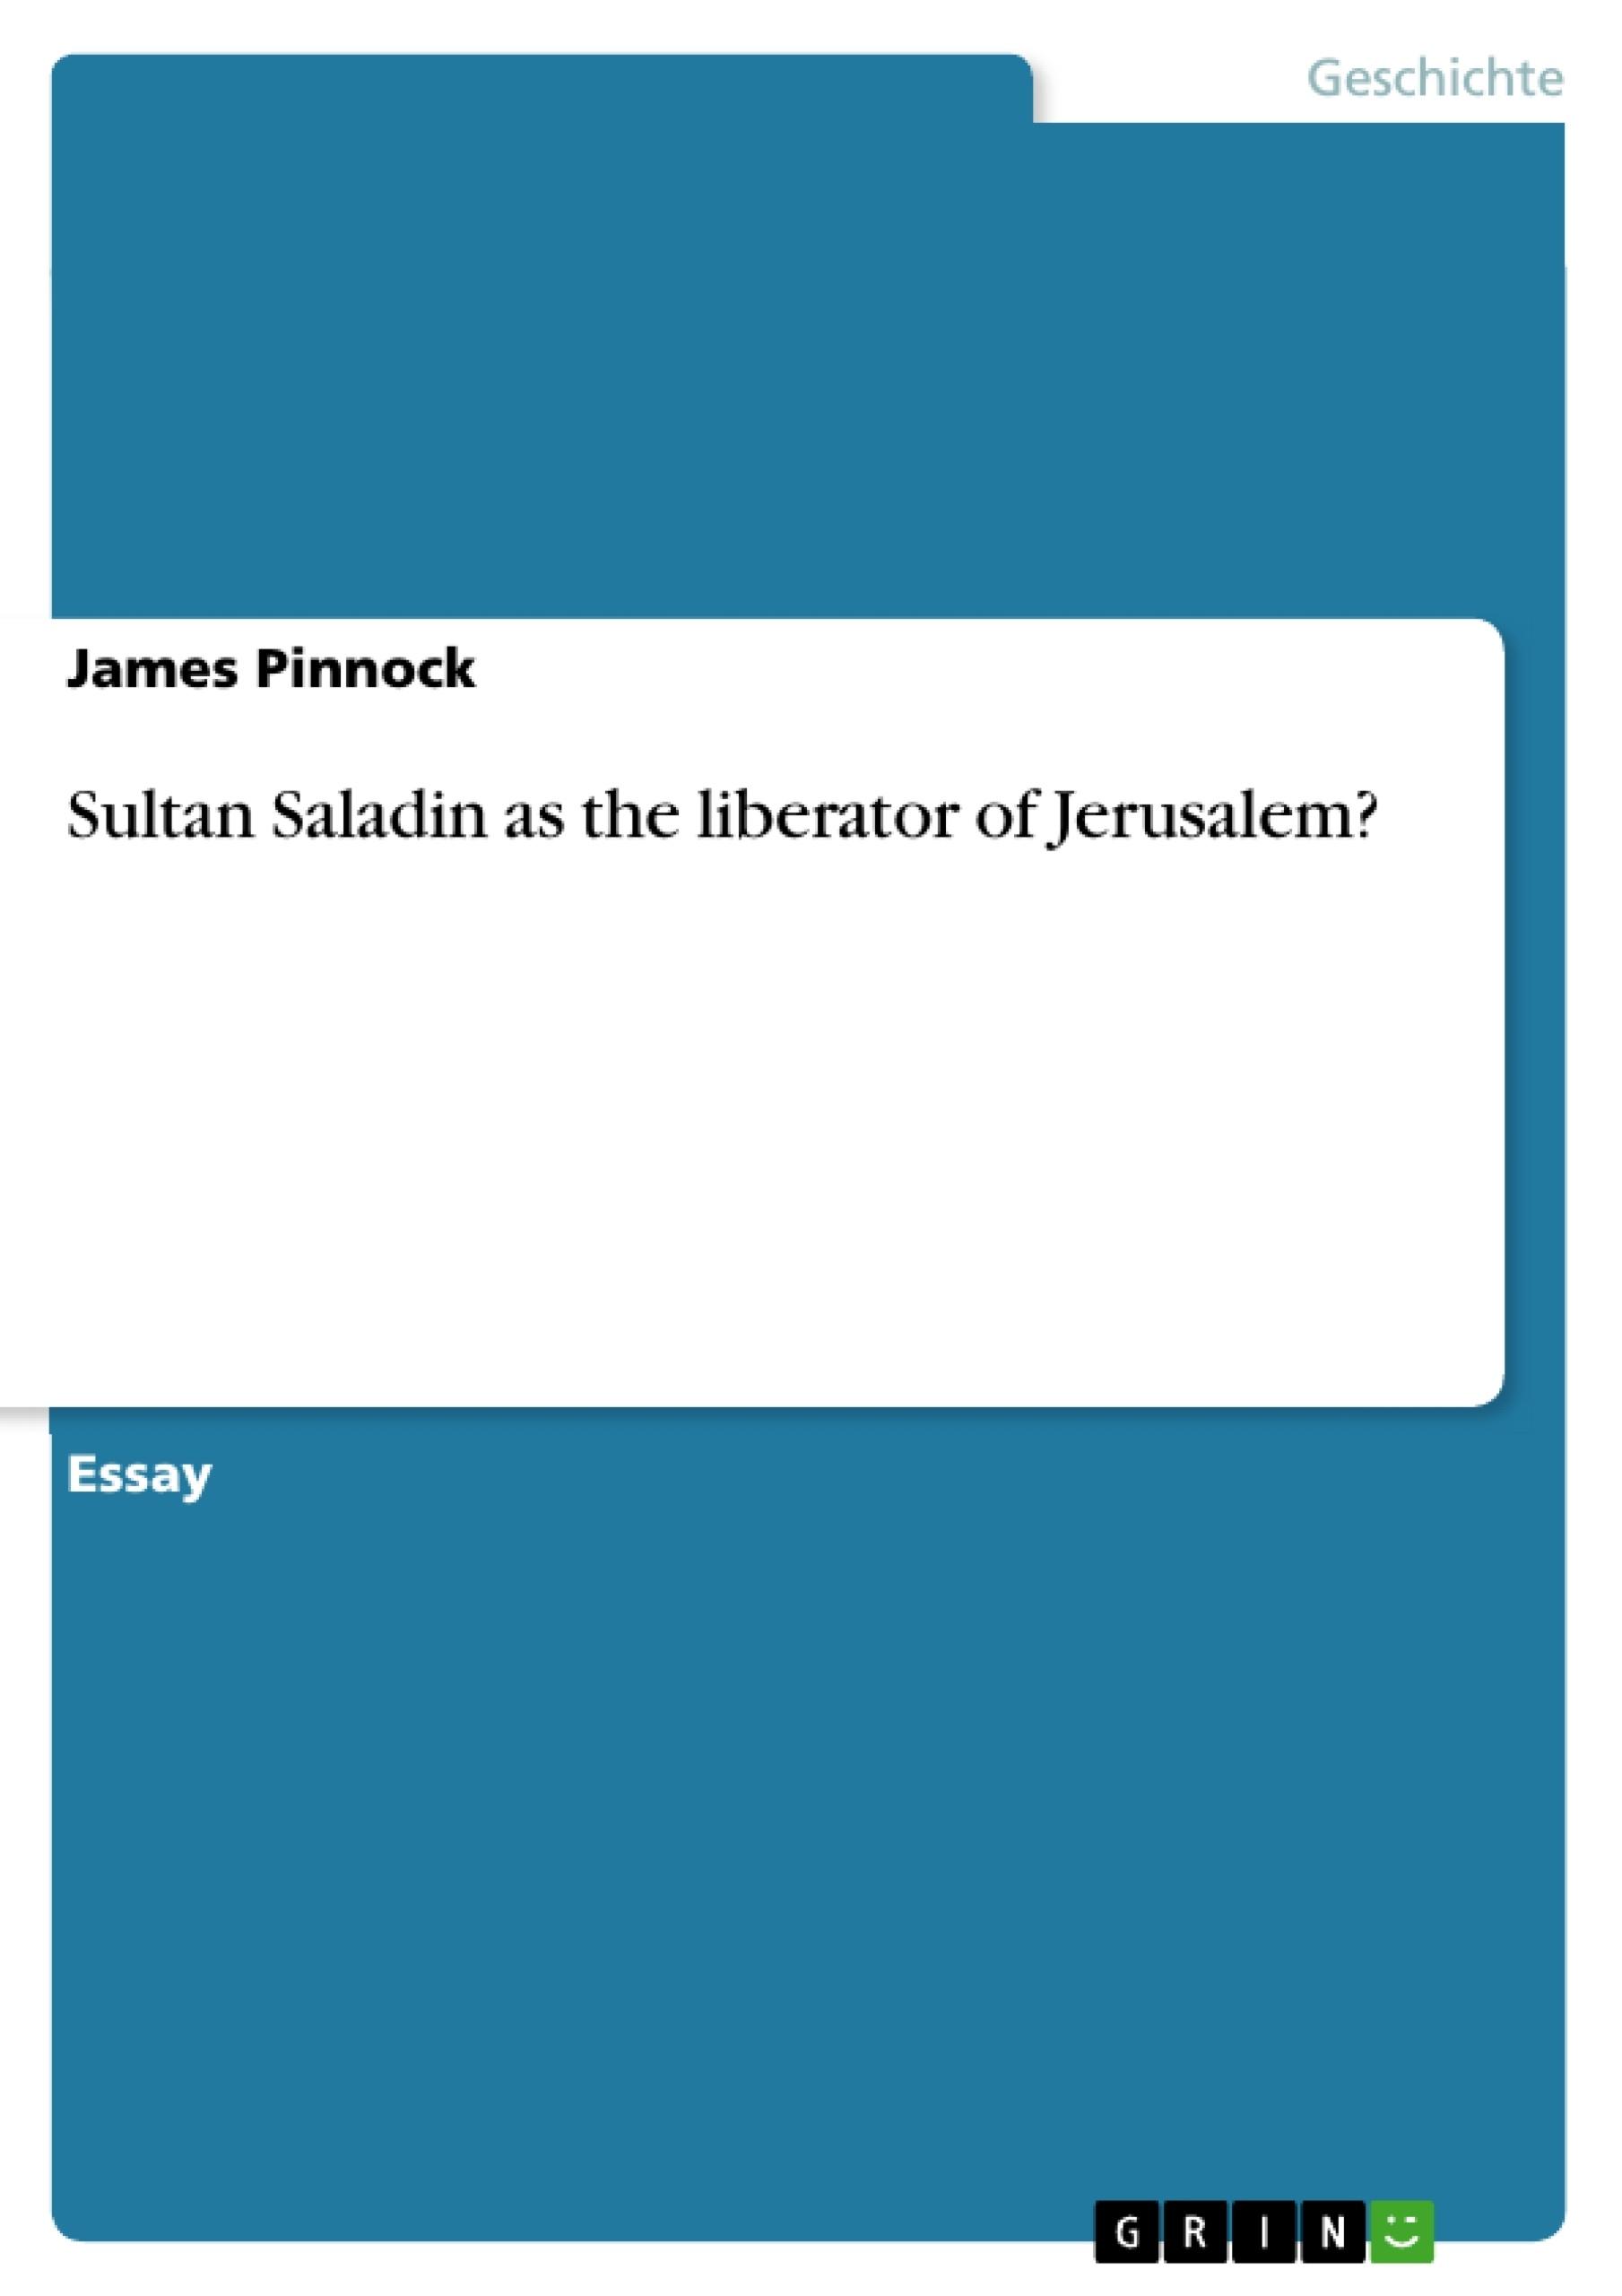 Titel: Sultan Saladin as the liberator of Jerusalem?